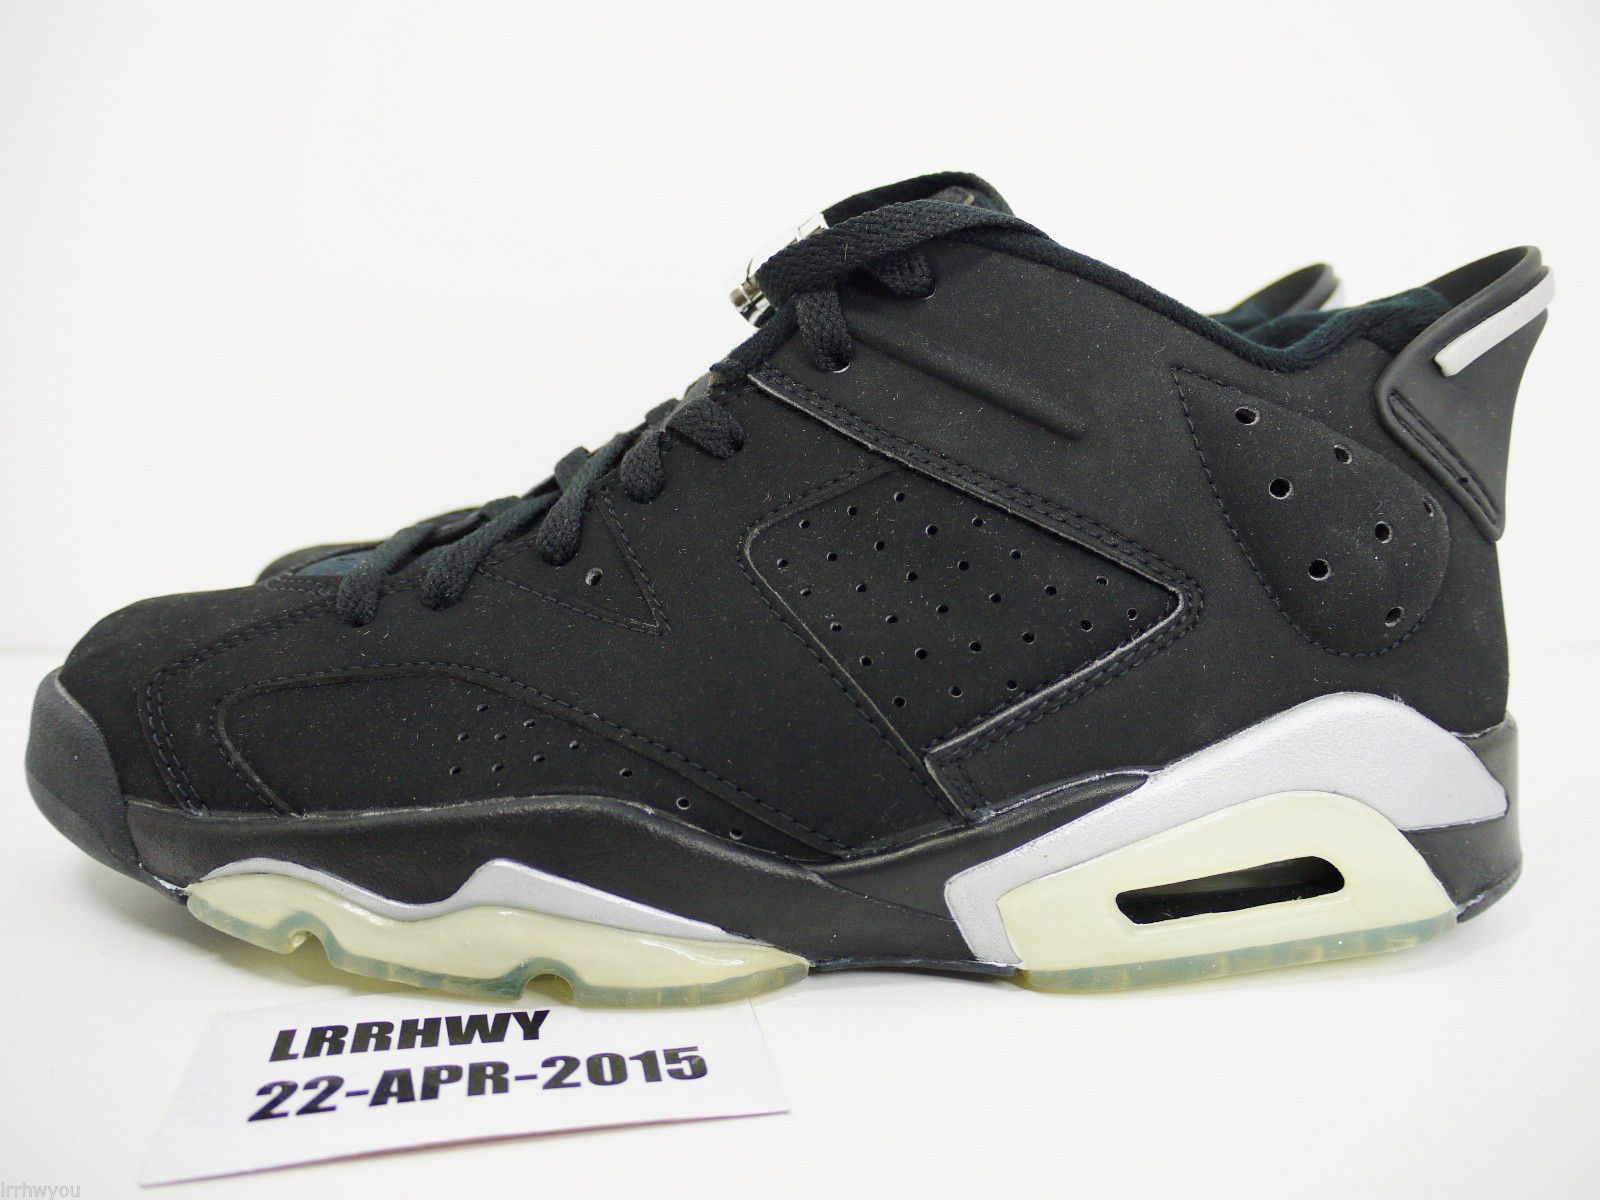 77ae5f9f736eb7 Nike Air Jordan 6 Retro Low 304401 061 Size 9 black metallic silver 2001